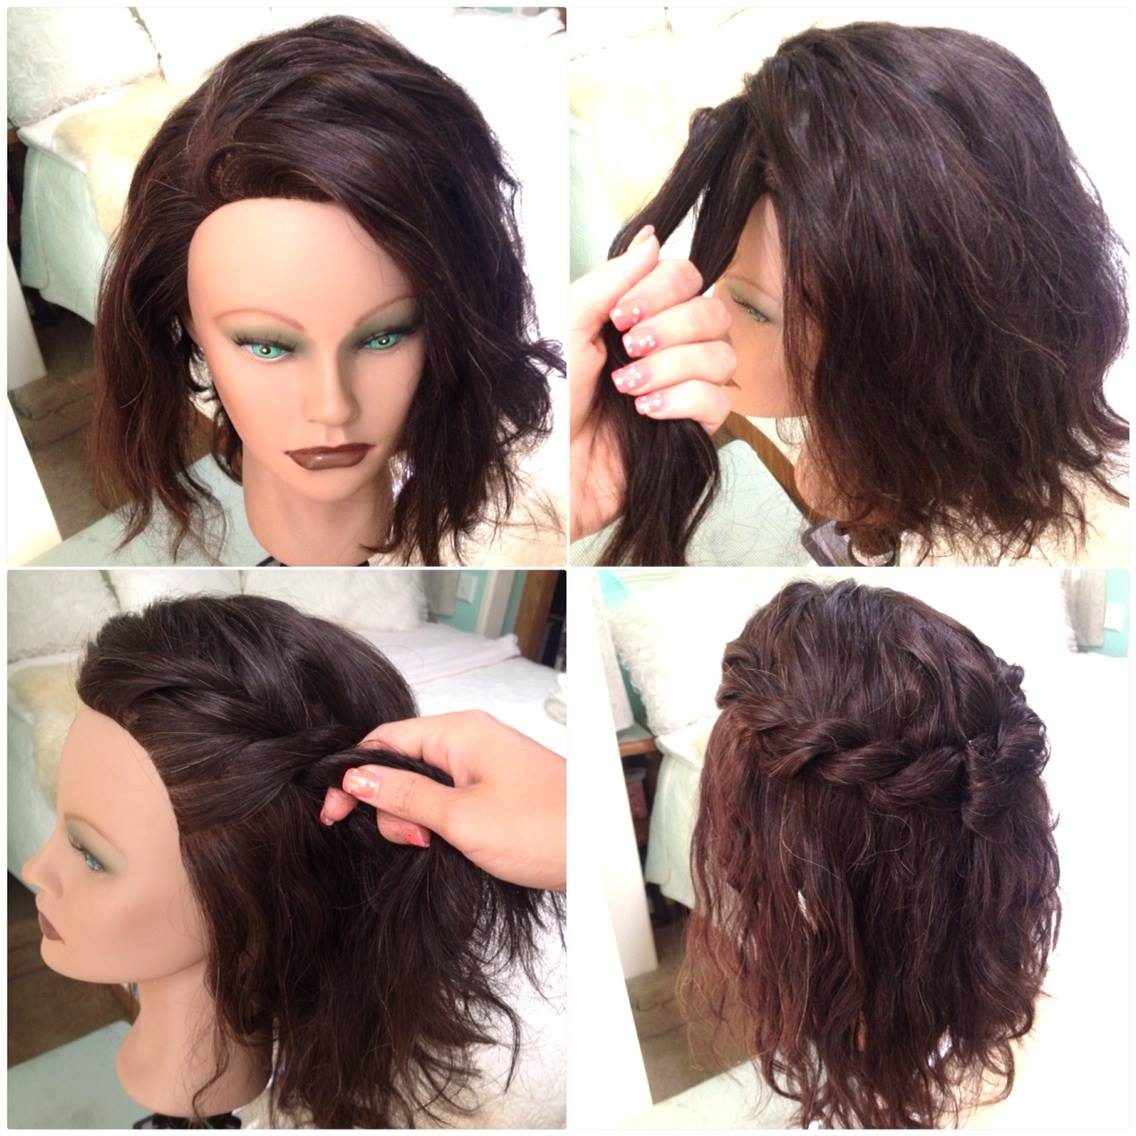 july 4th cool hairstyles - shear miracle organics